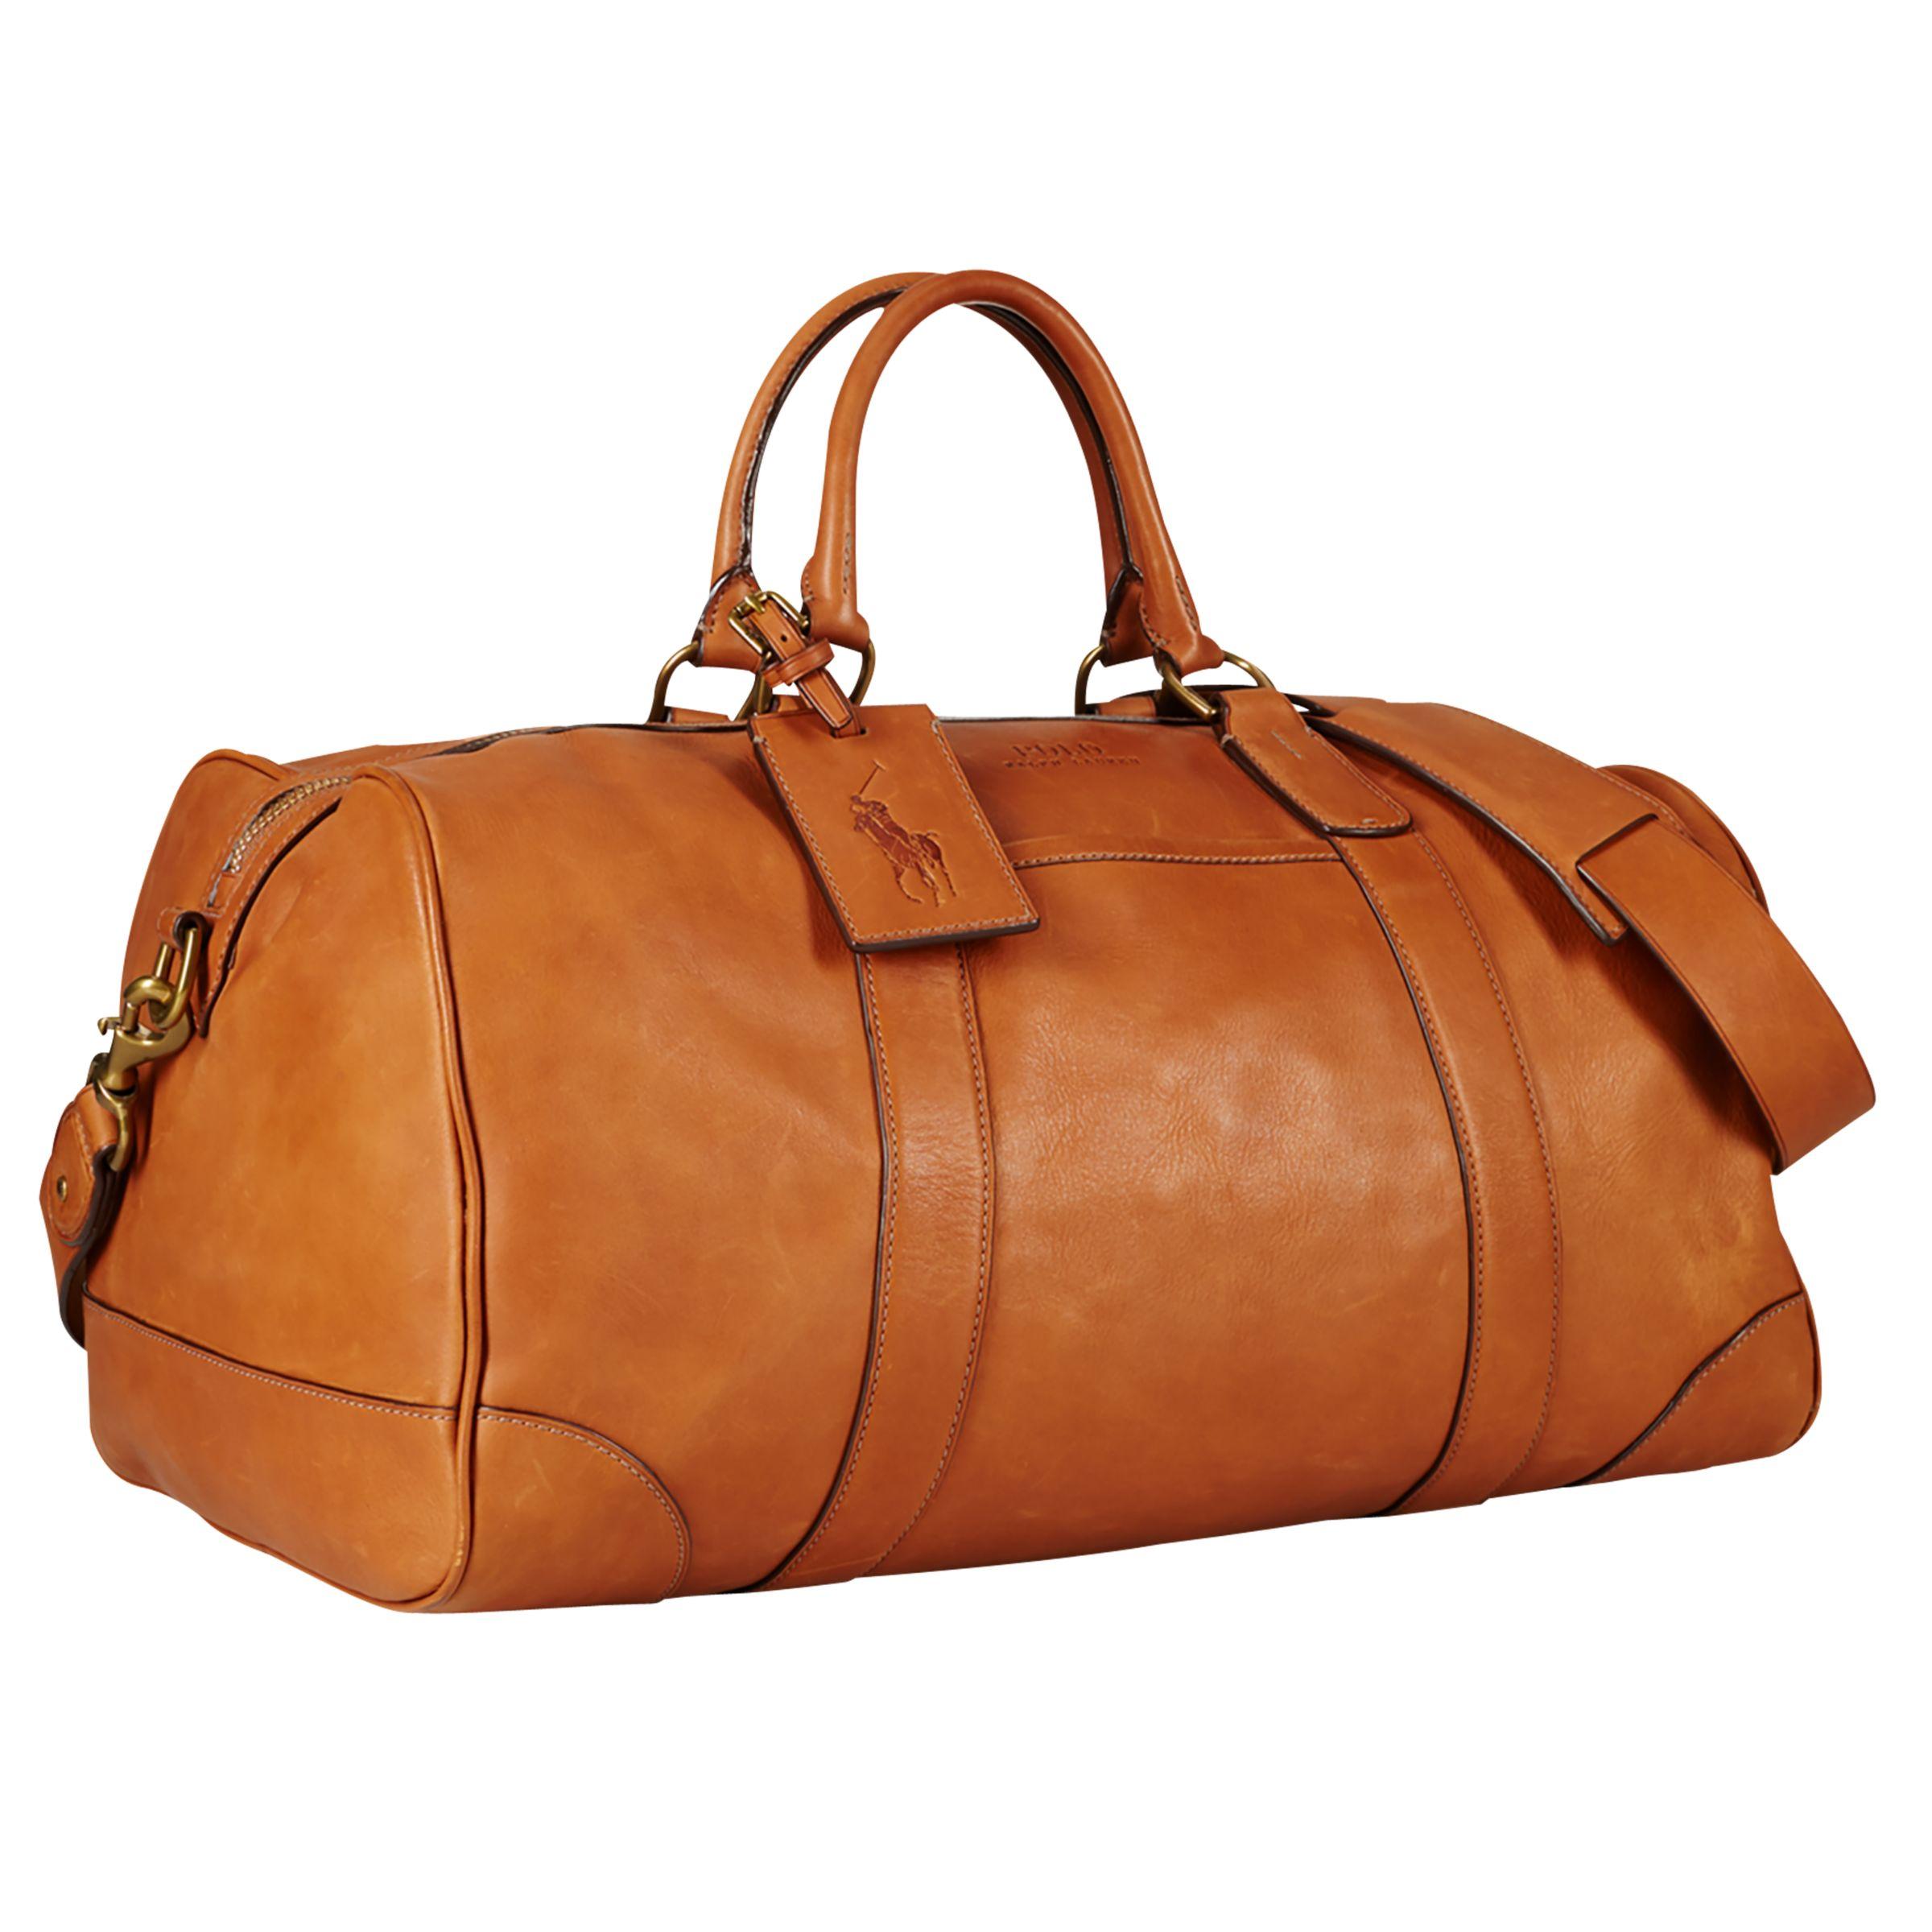 Polo Ralph Lauren Barrel Duffel Bag 727f88f810726